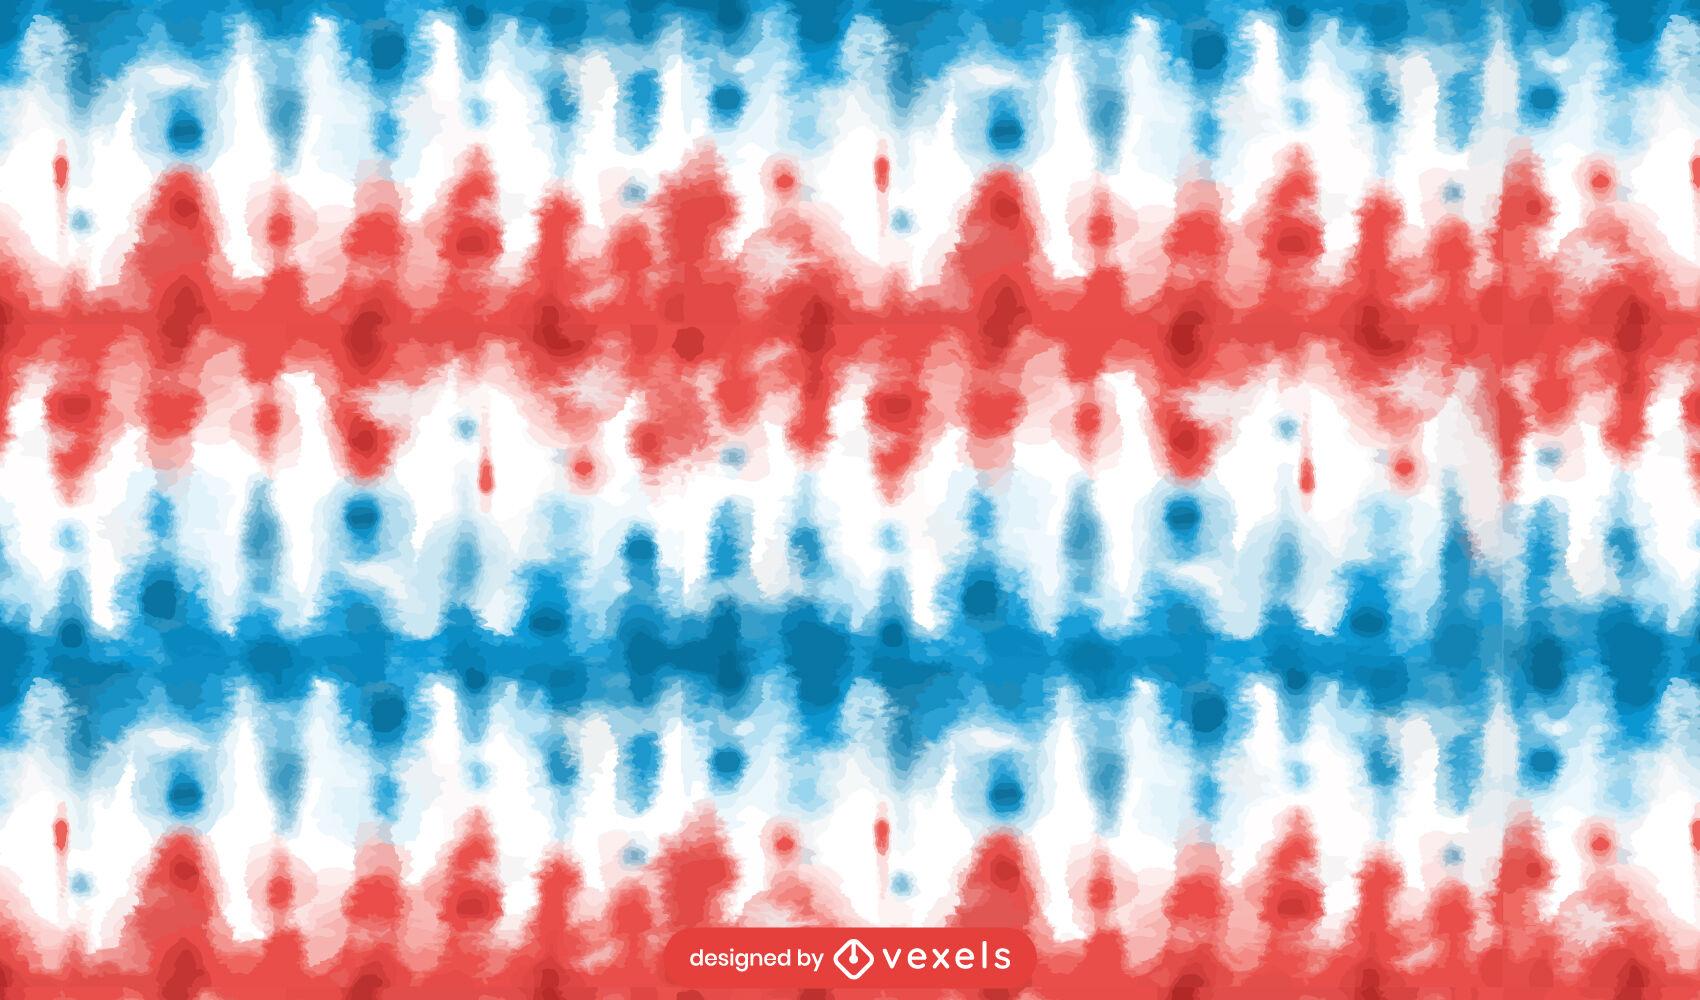 Cores da bandeira americana padrão tye dye